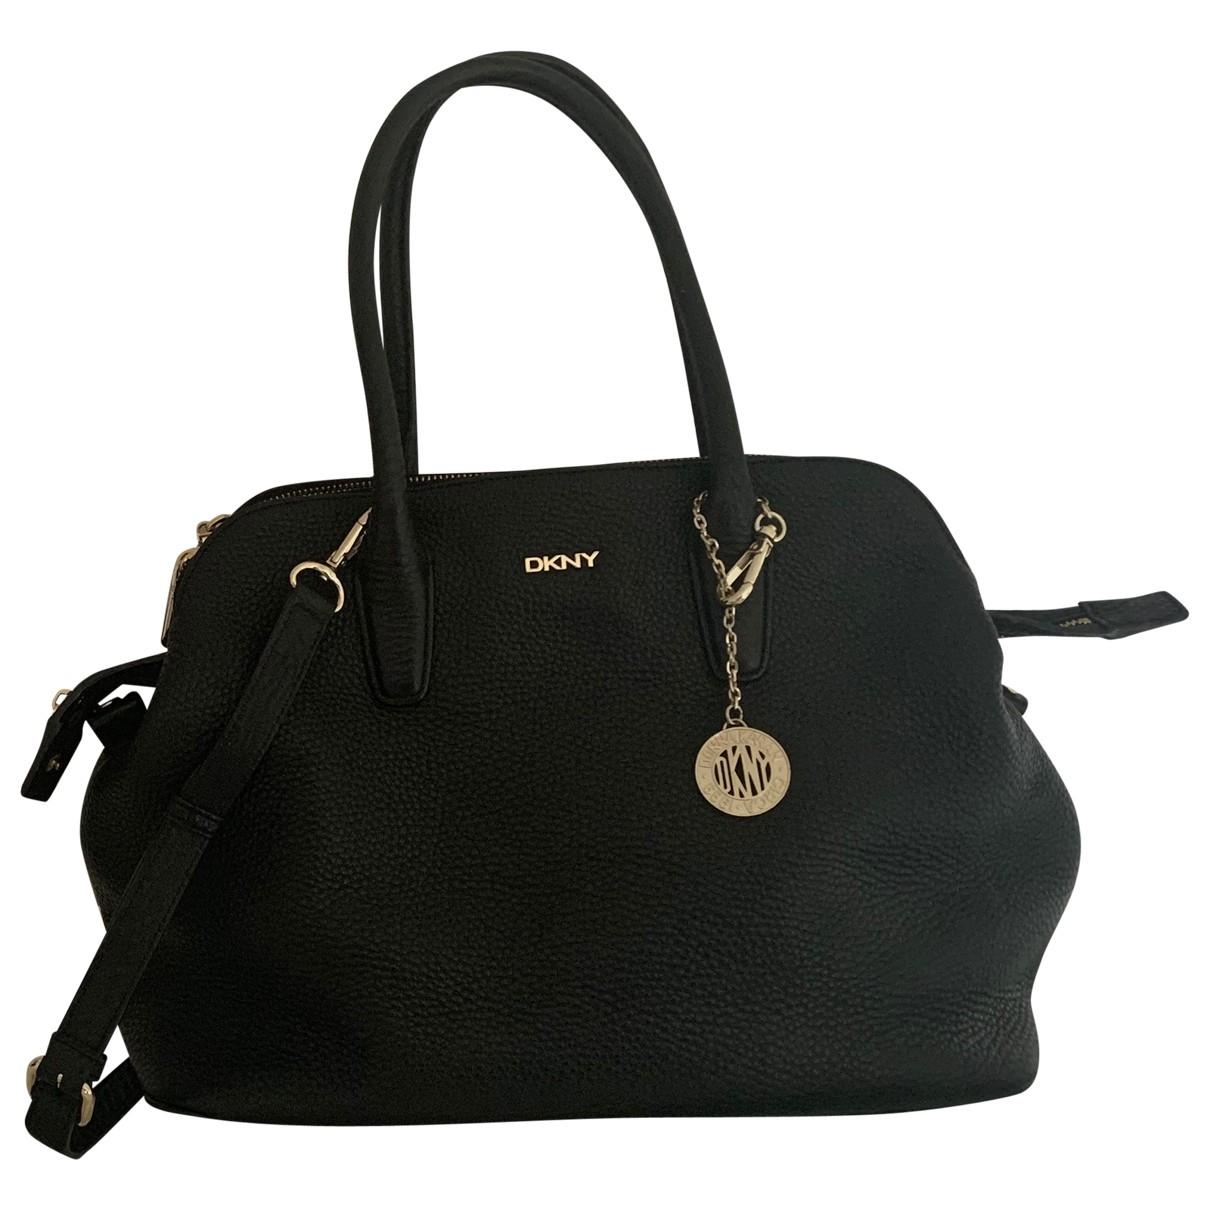 Dkny \N Black Leather handbag for Women \N